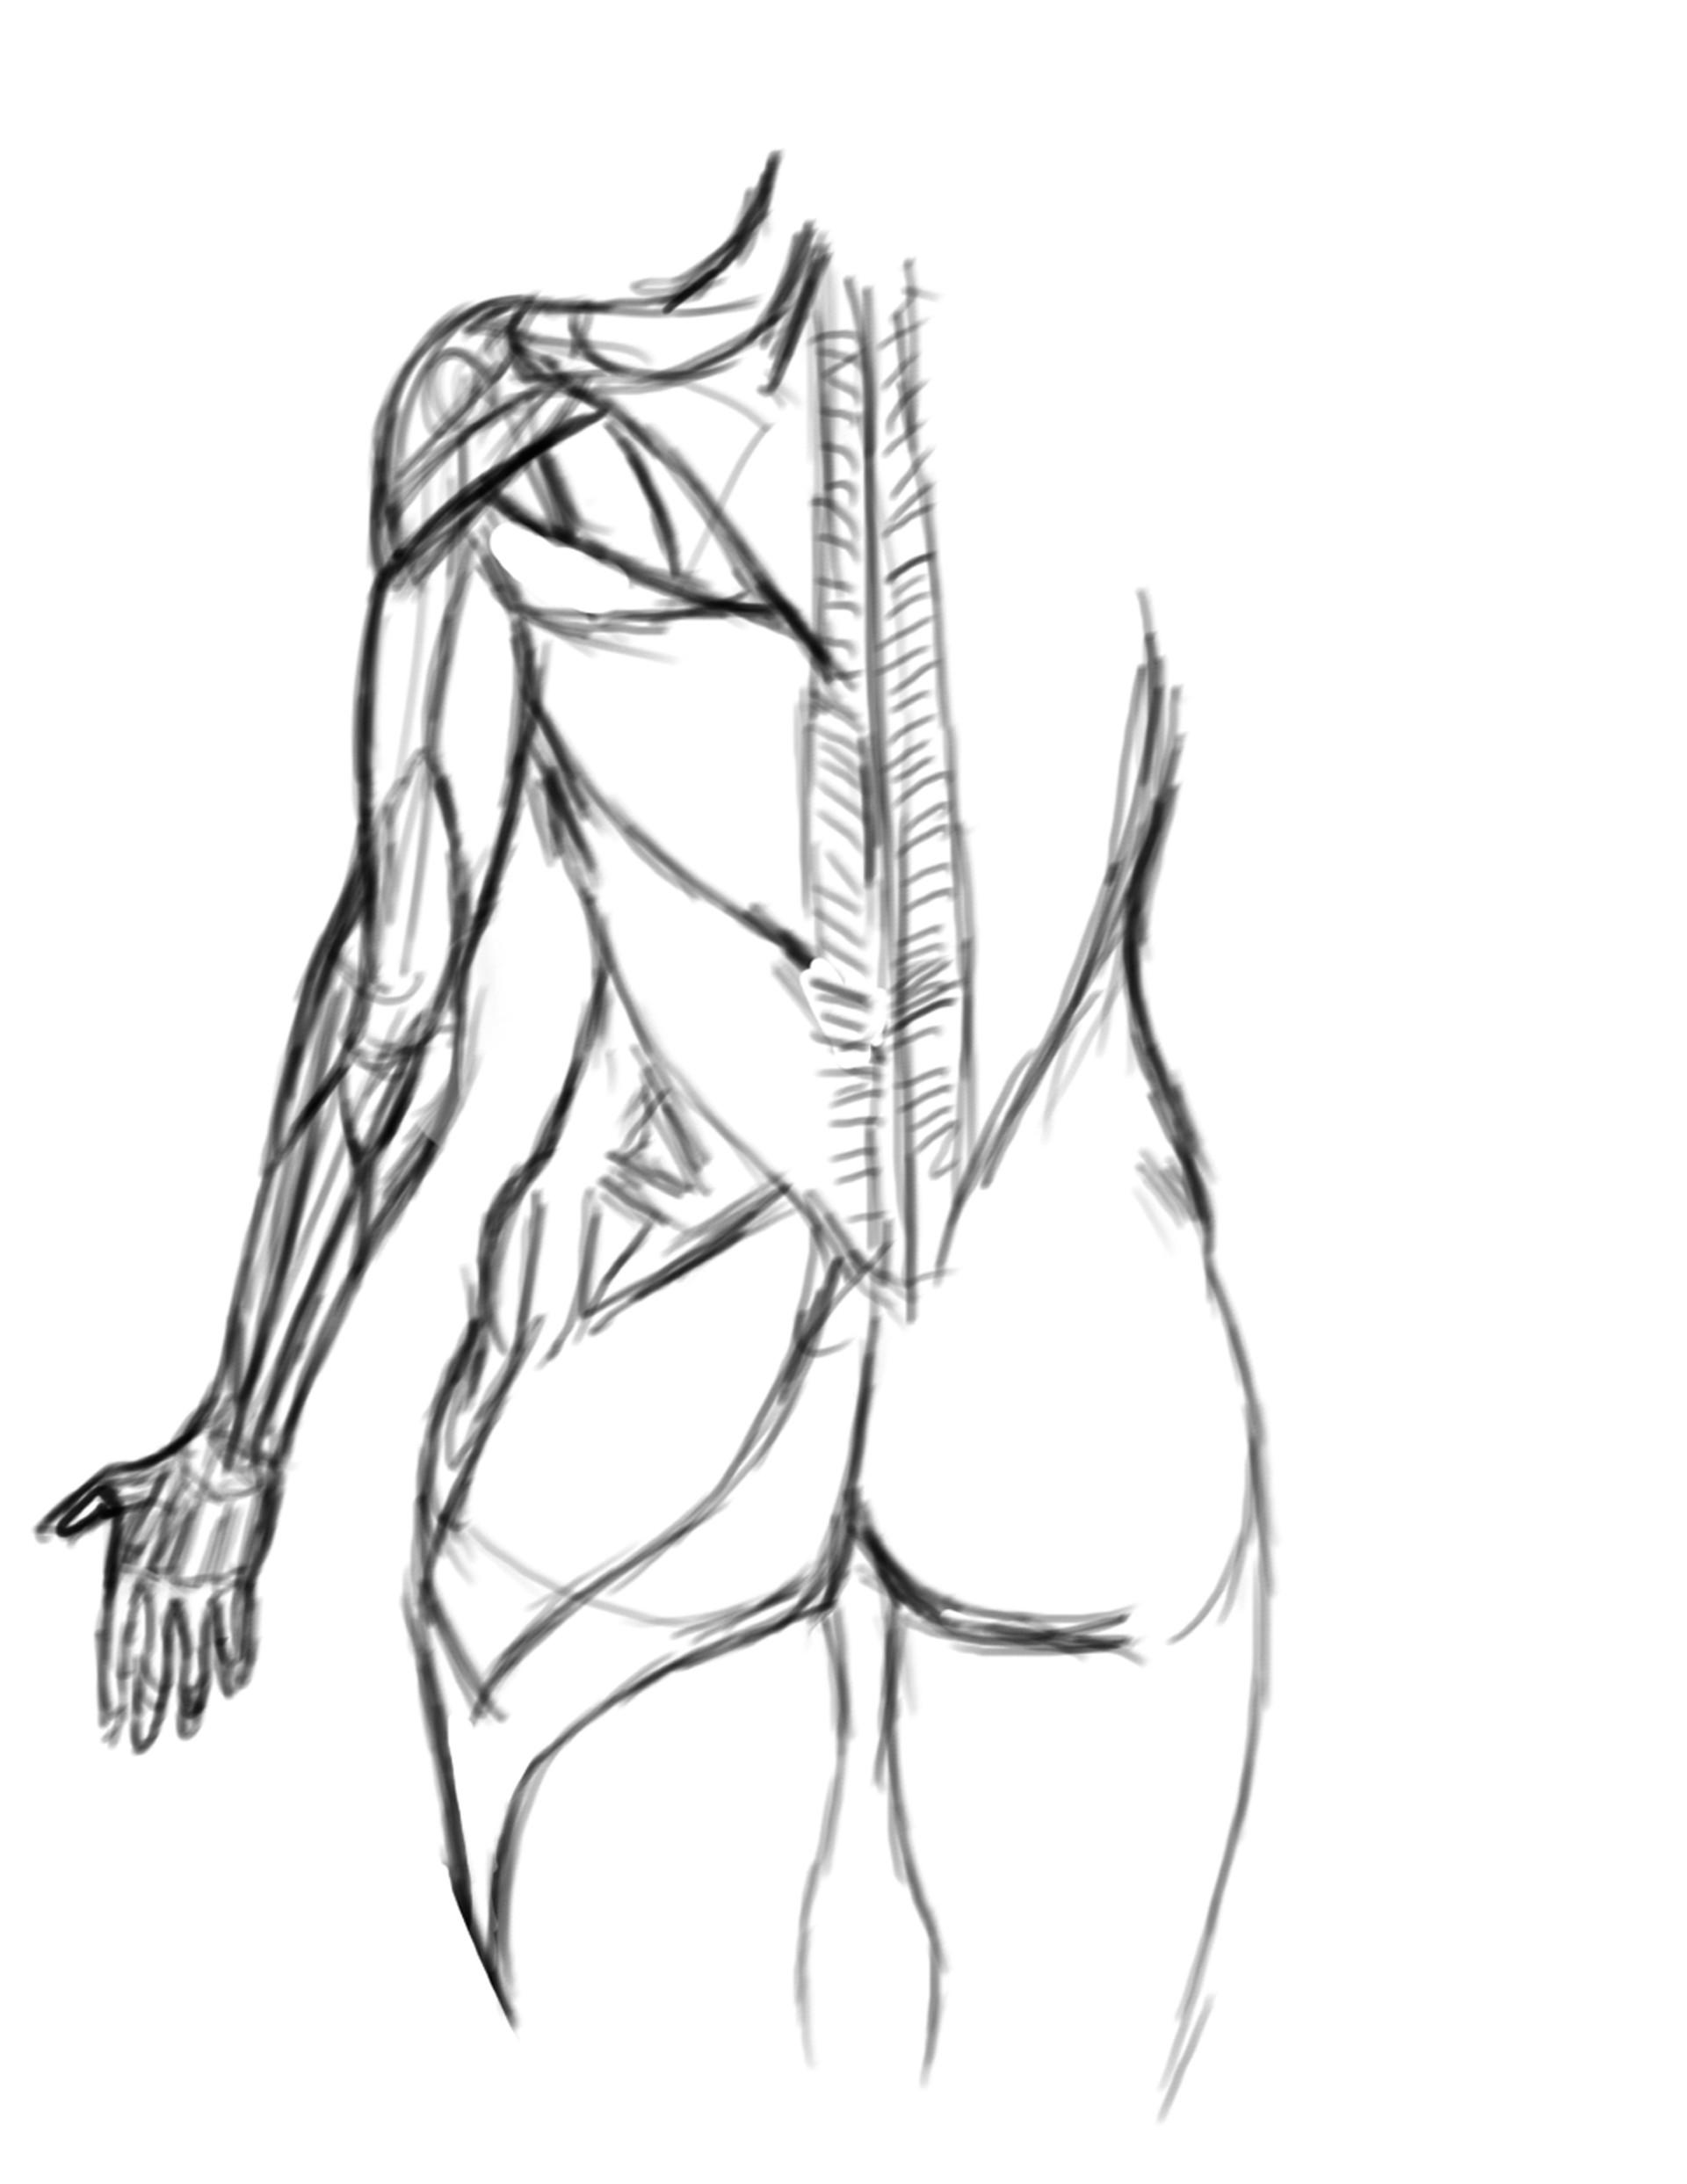 Pedro E Anatomy Tools Female Anatomy Sculpture Study